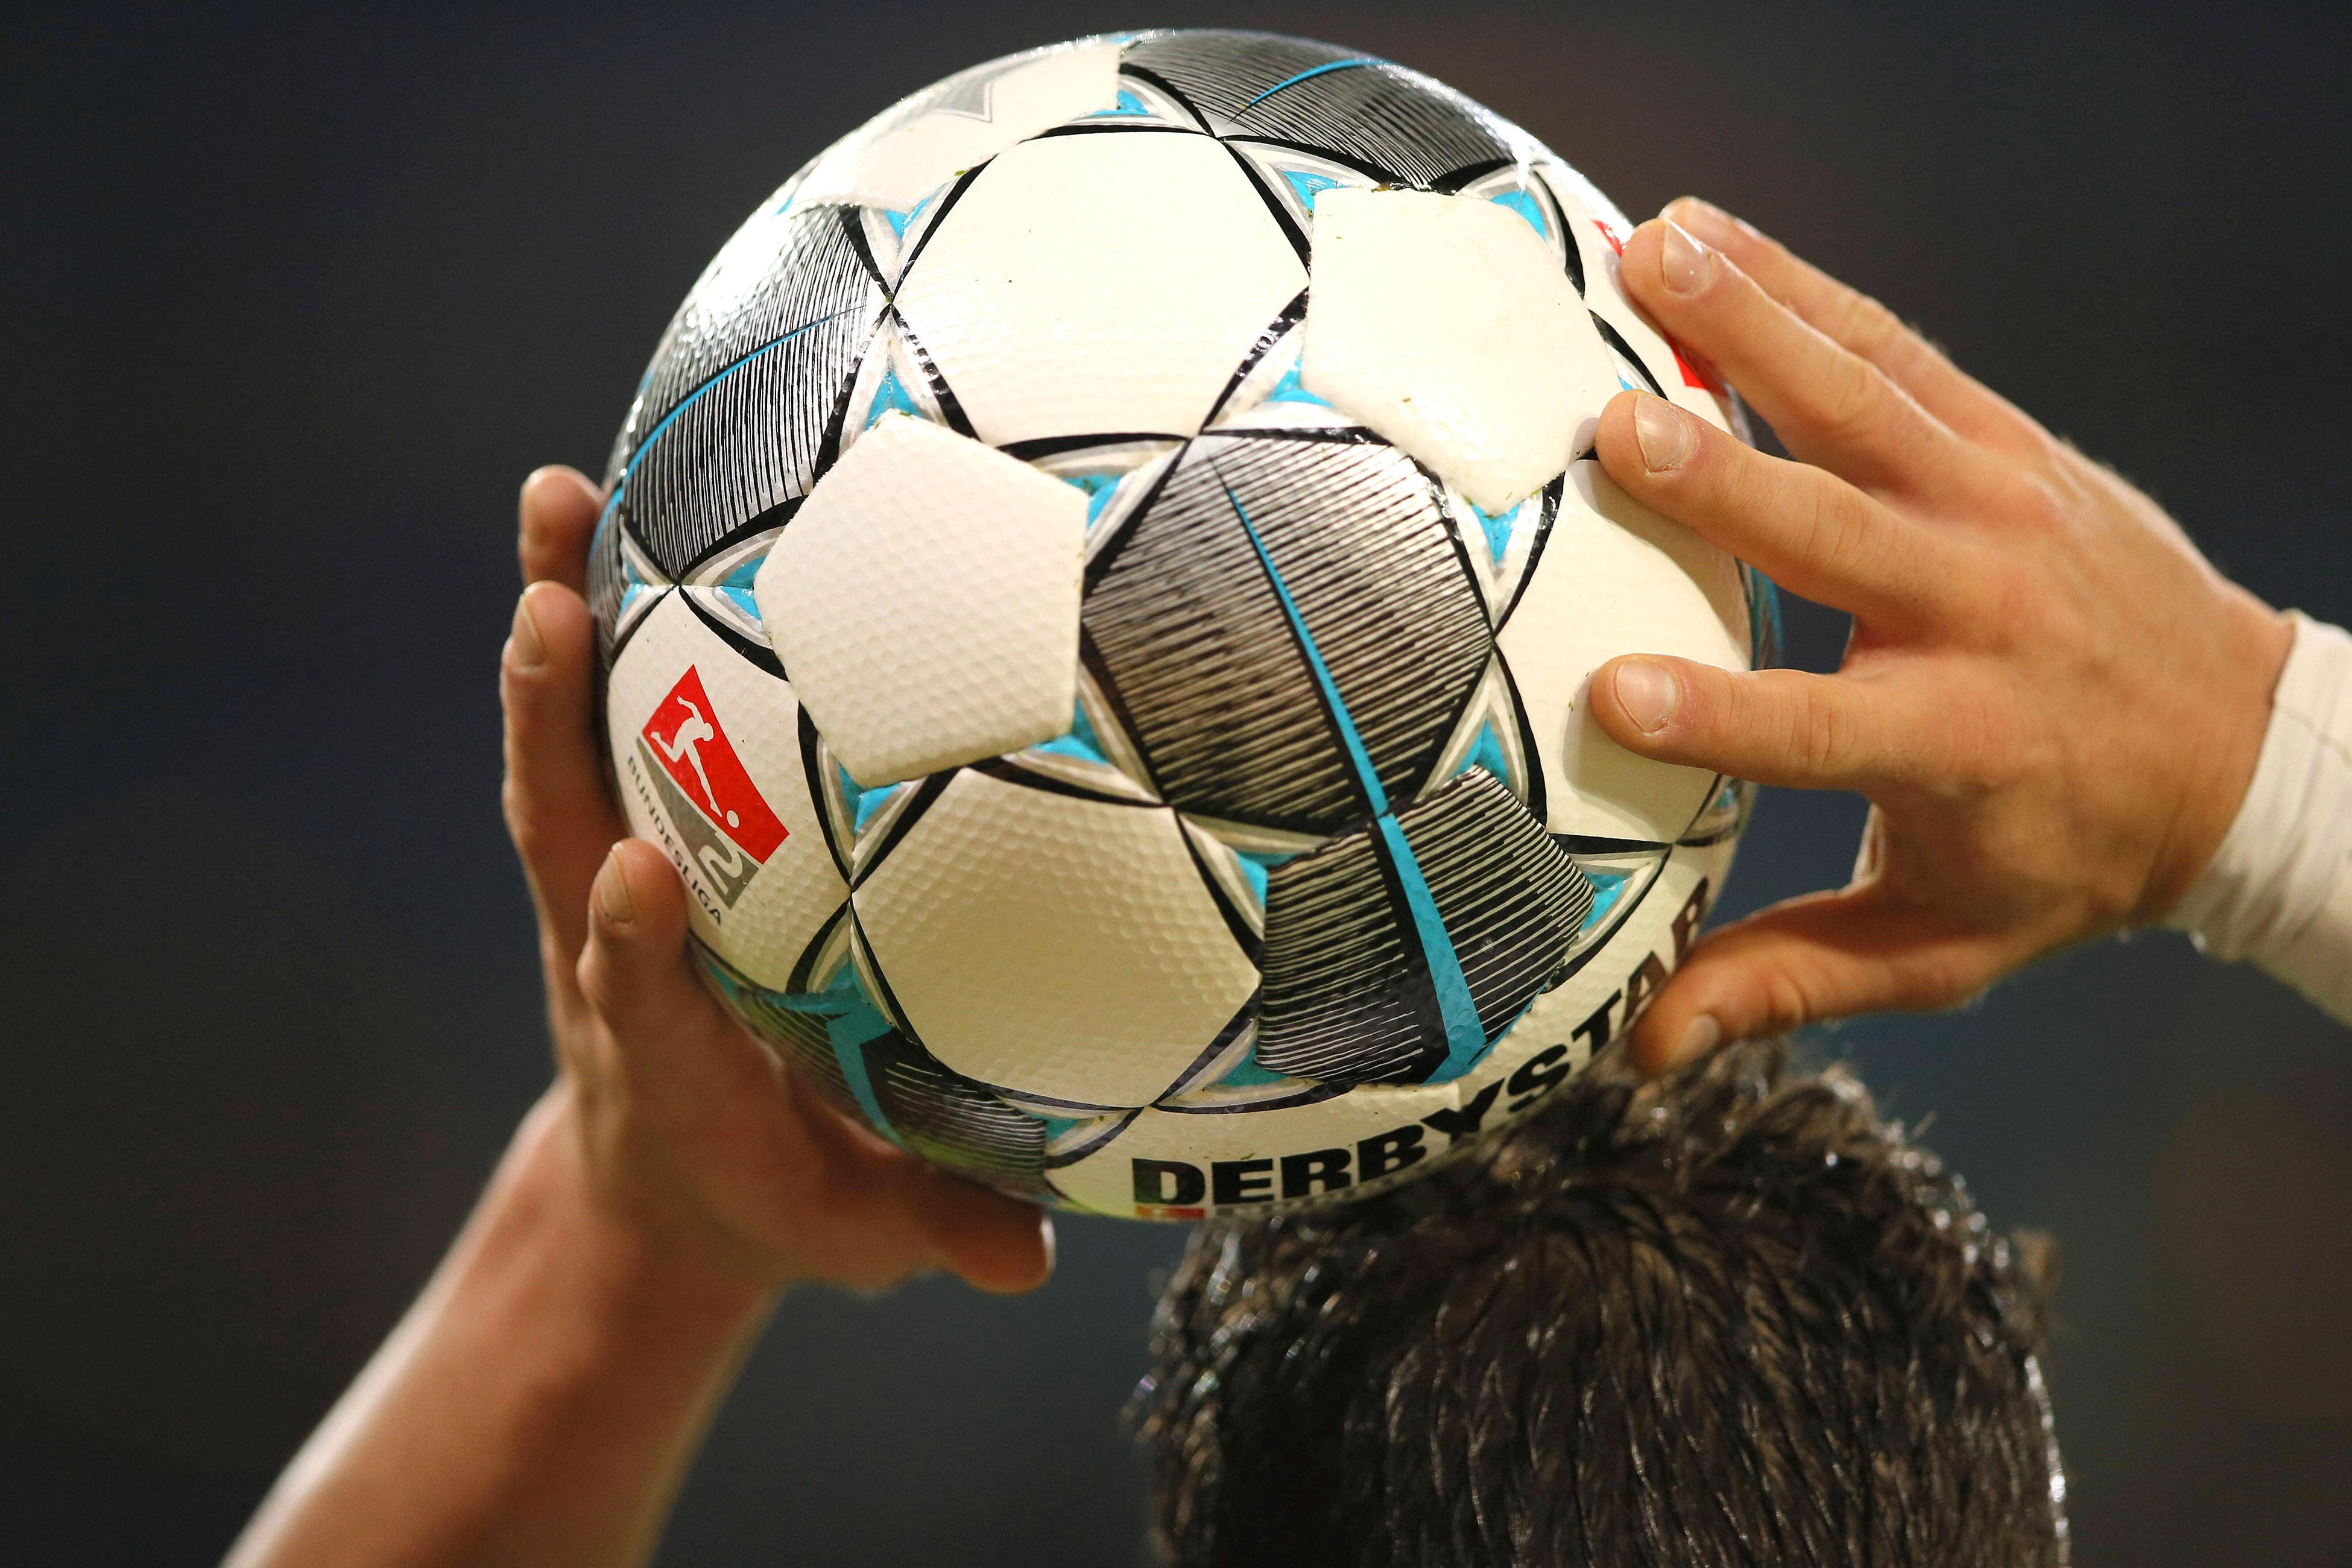 Select Rucksack Verona Handball Volleyball Fußball Sport Training Schule Fitness